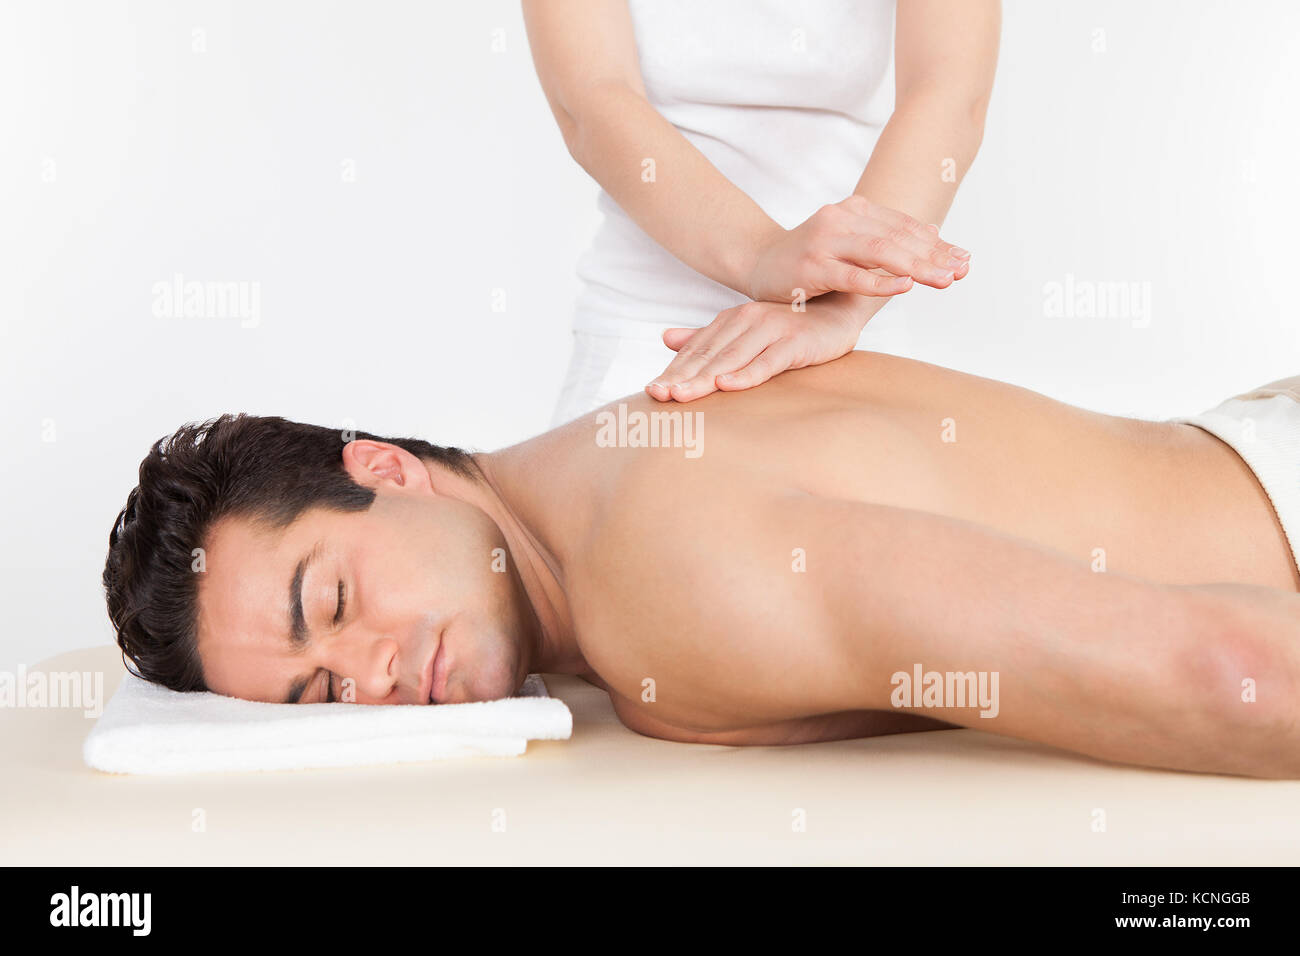 Схема массажа баночного массажа